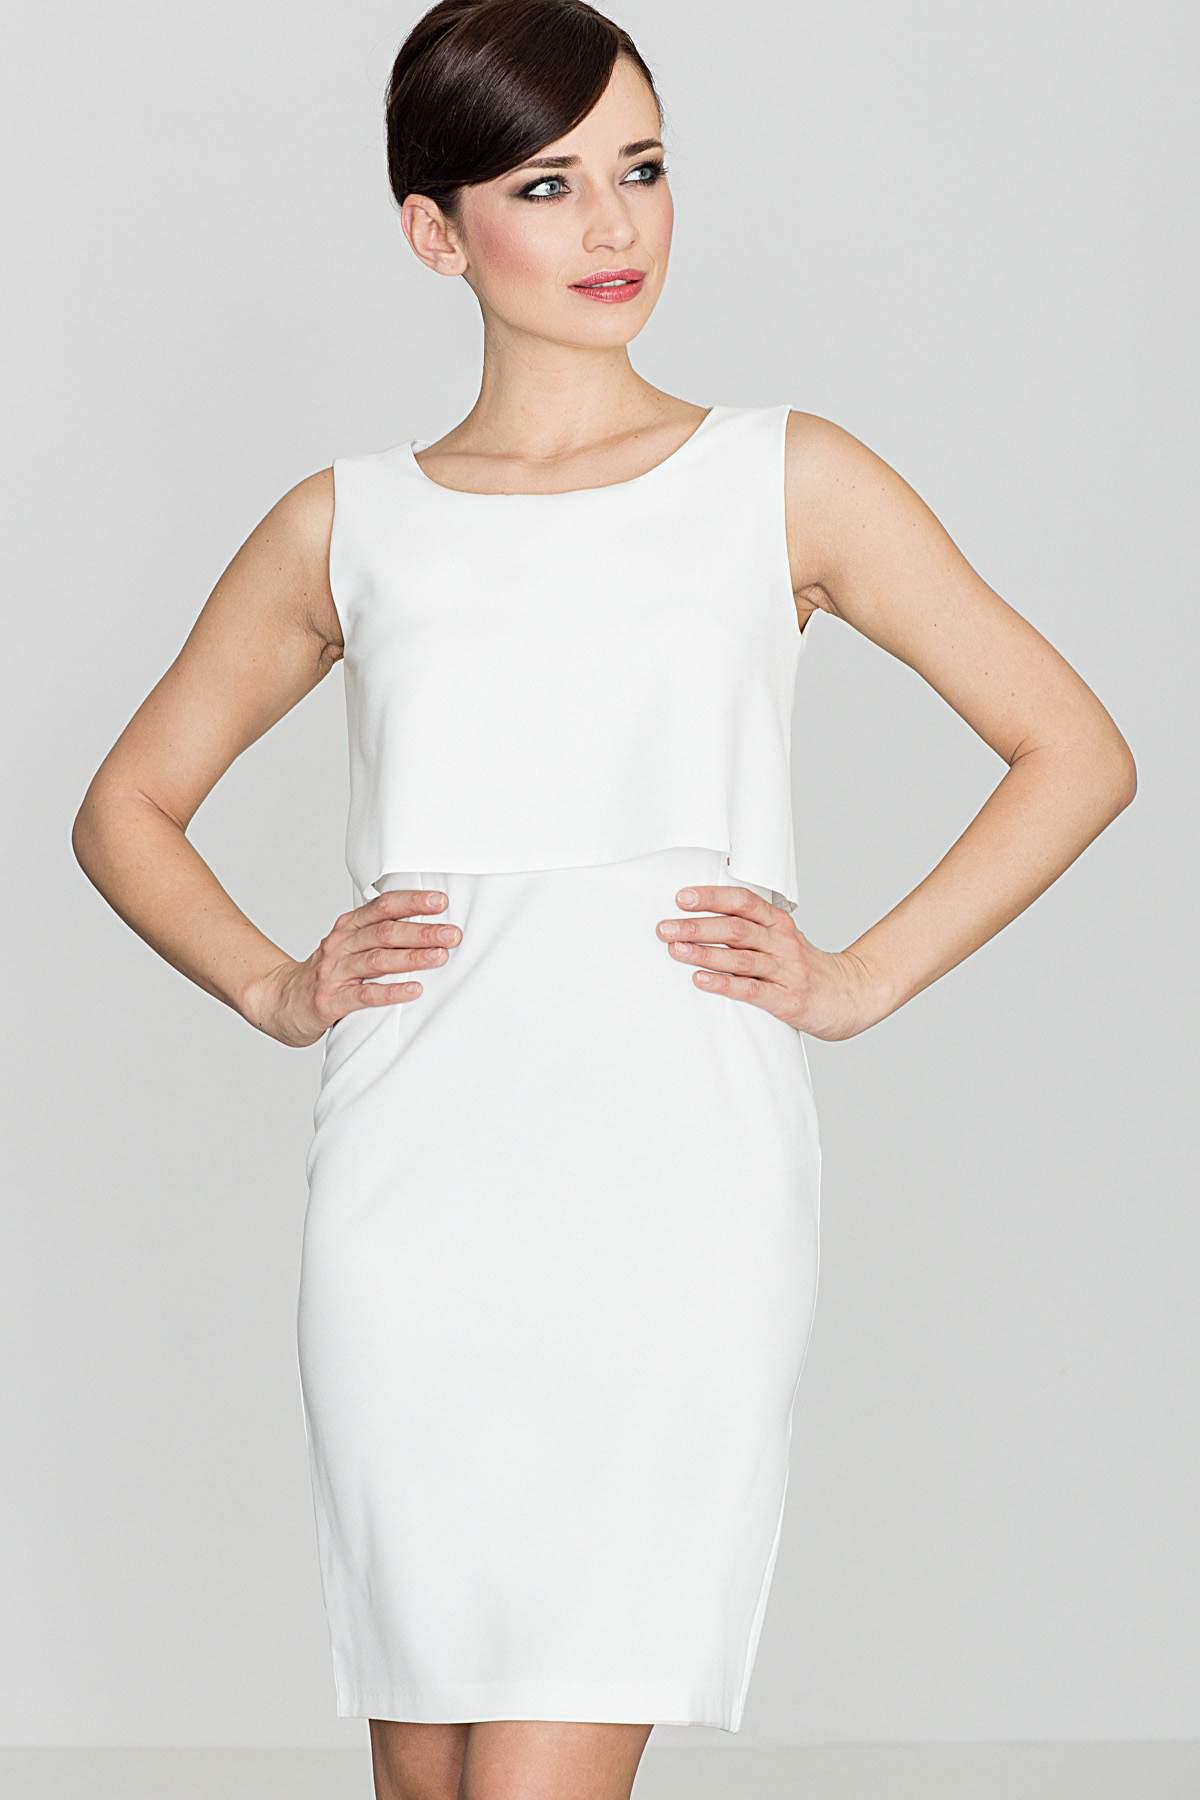 KATRUS κομψο midi φορεμα